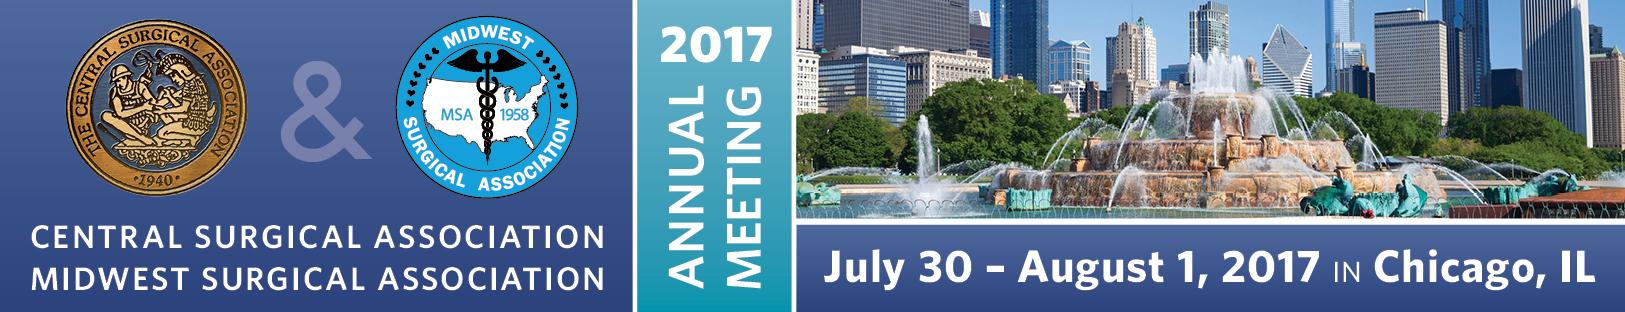 CSA-MSA 2017 Exhibitors and Sponsors